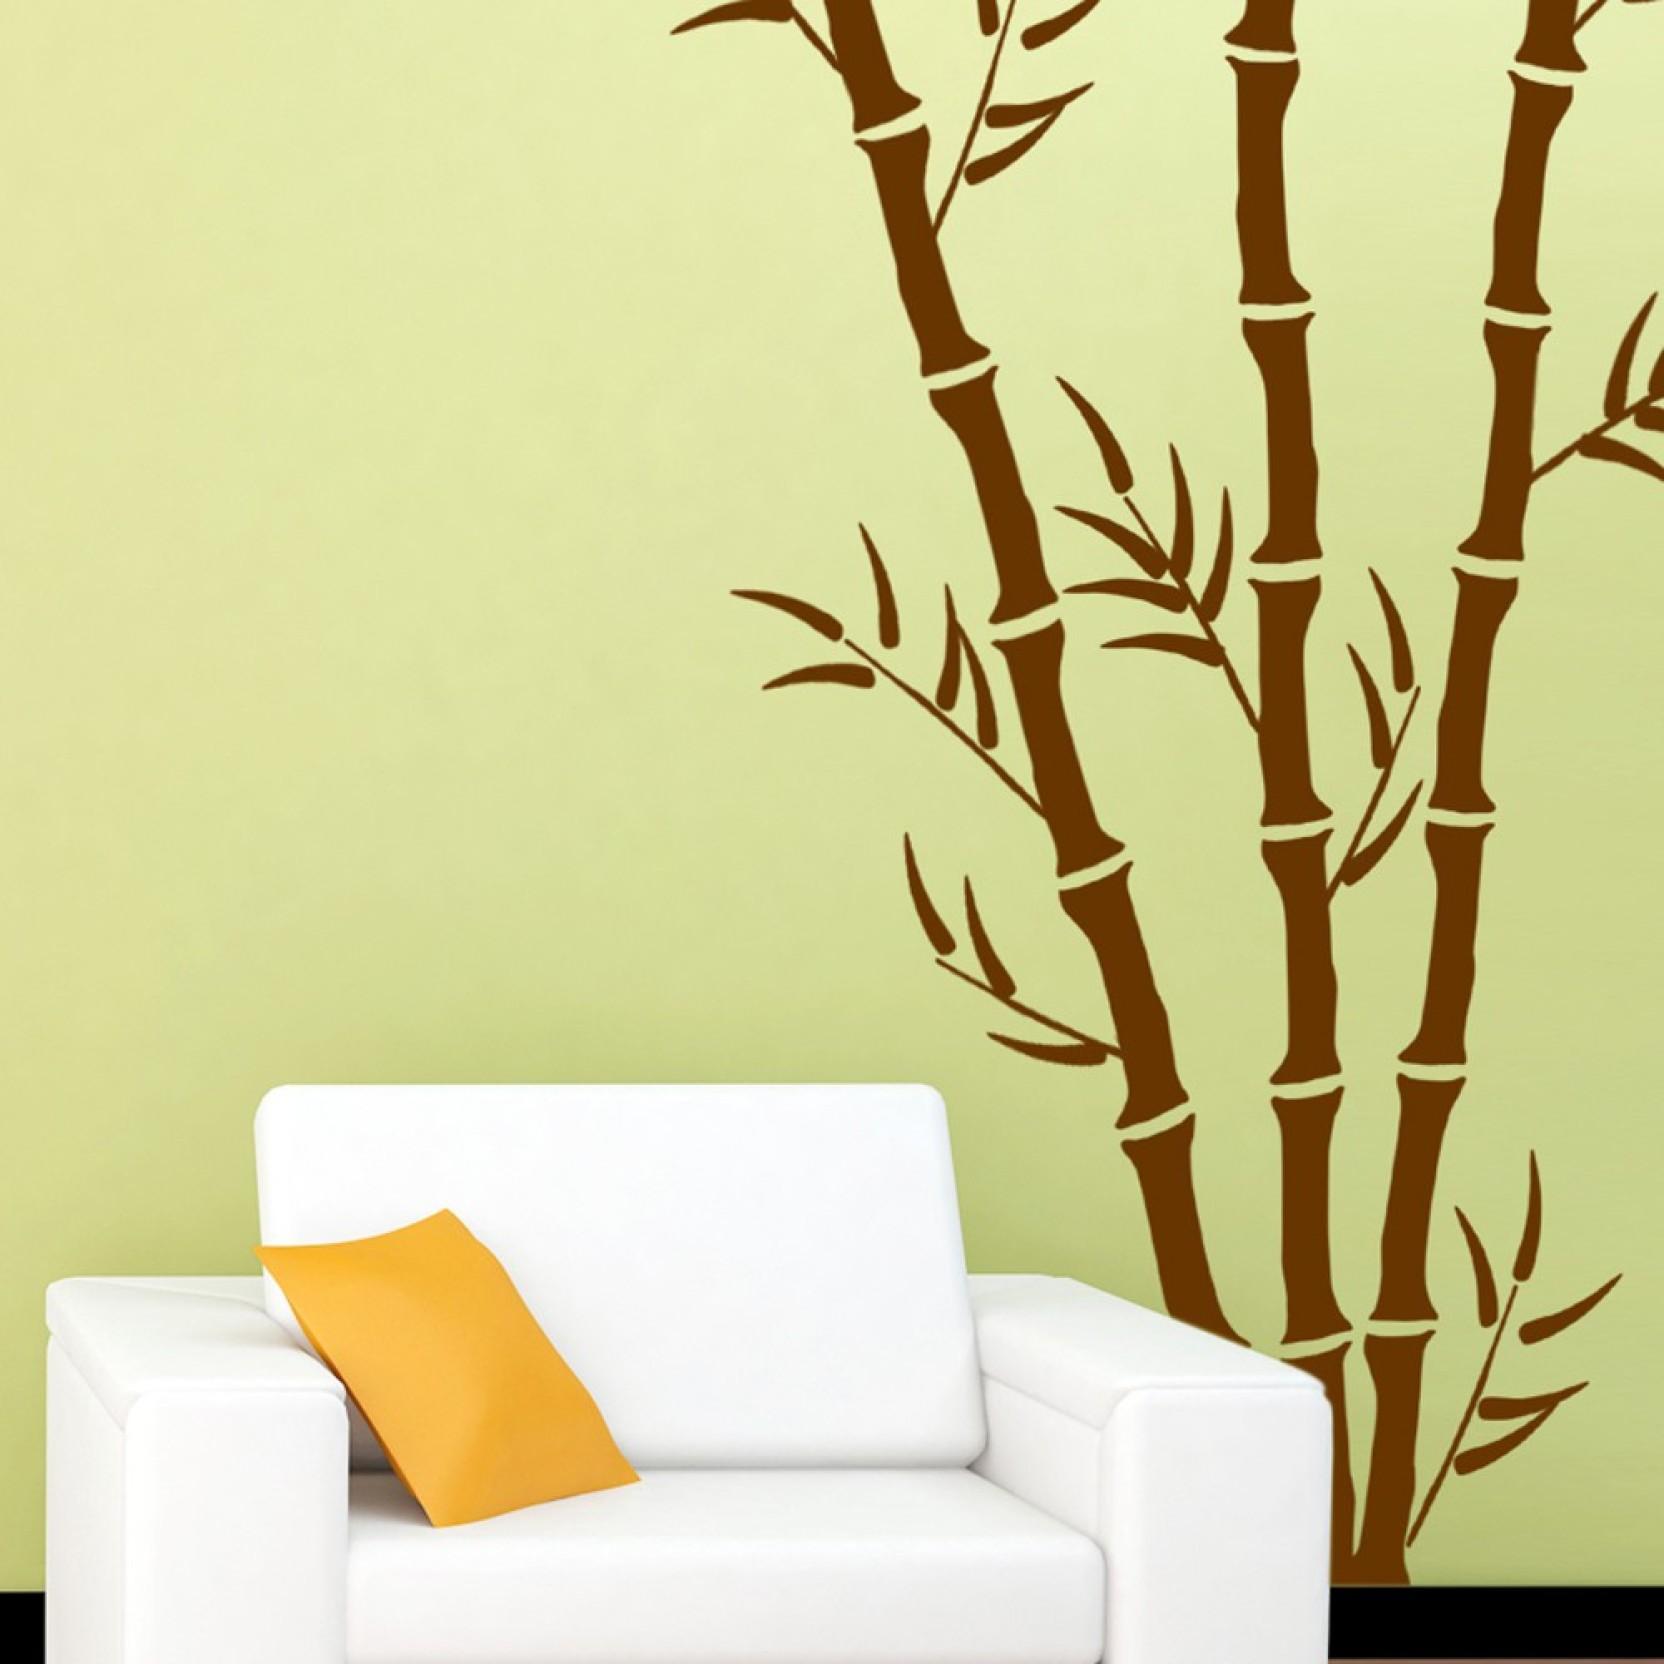 Arhat Stencils BAMBOO ASR-E127 GLOSSY PVC (Wall Décor & Art) Stencil ...